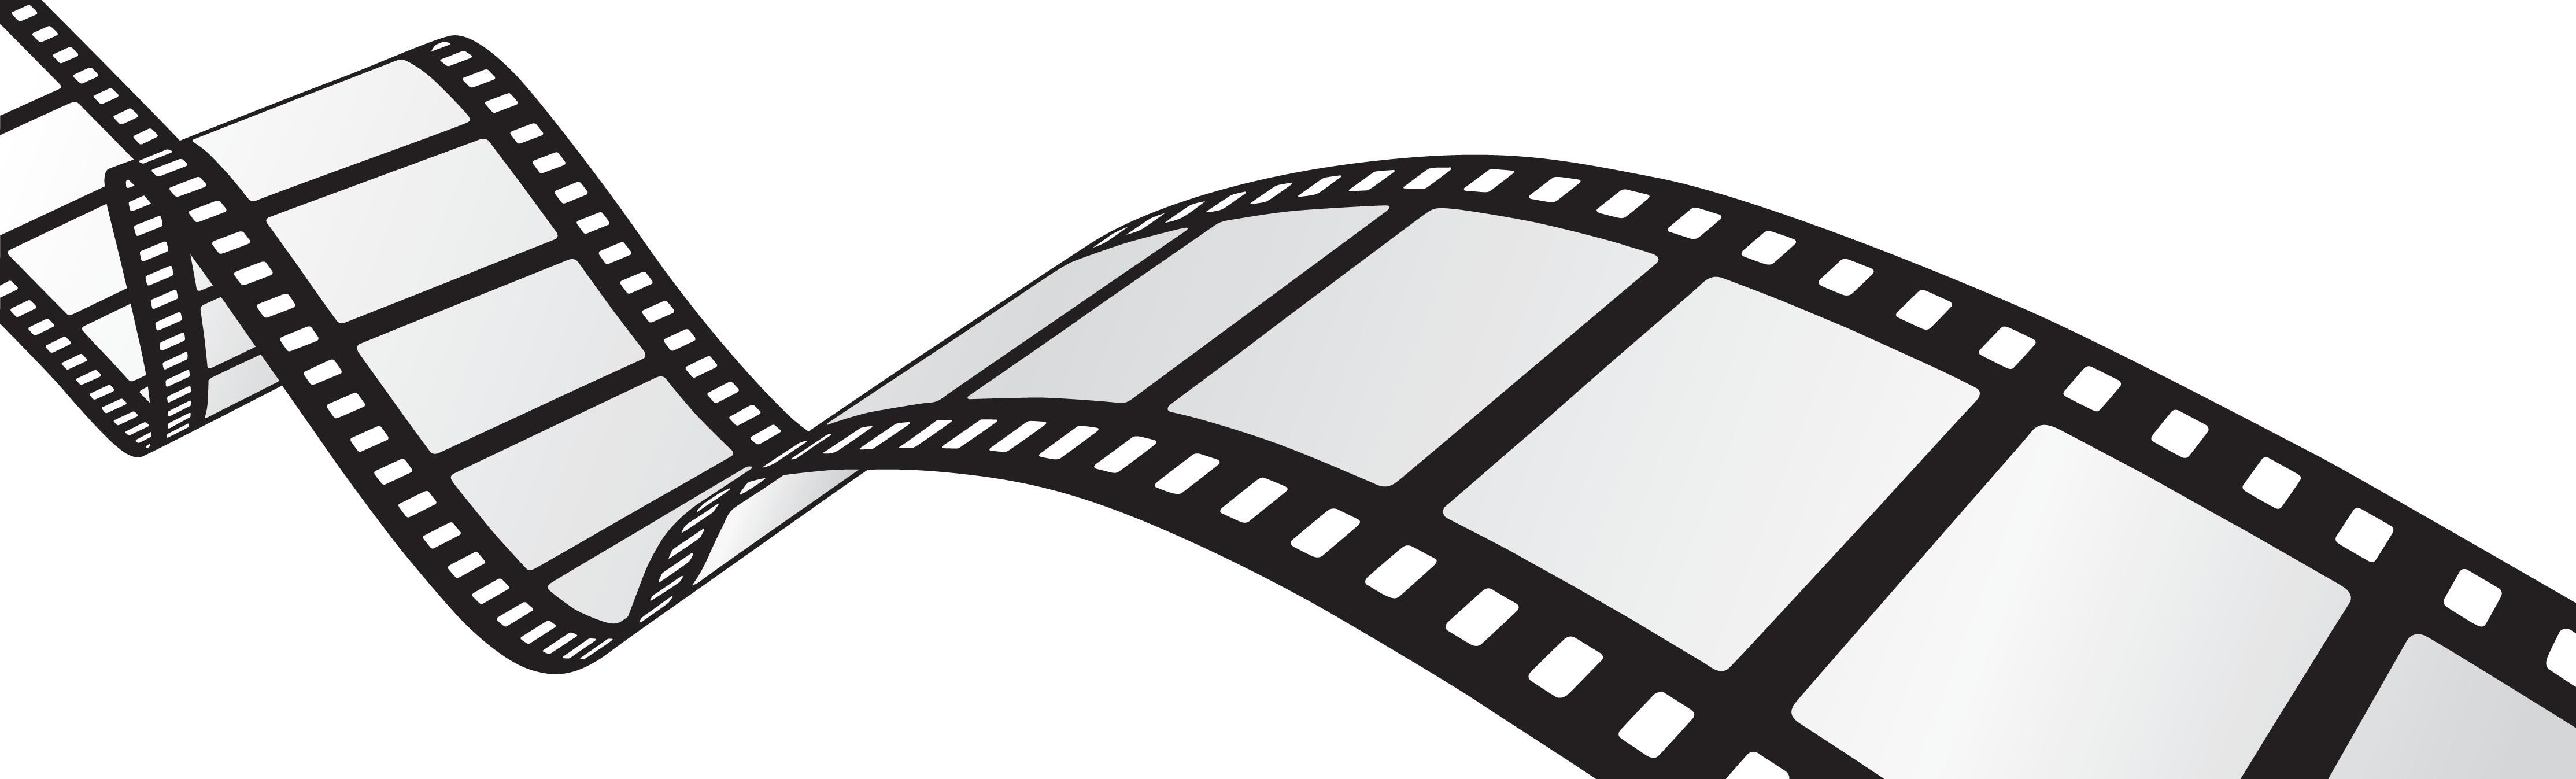 Film Reel Clipart Transparent.